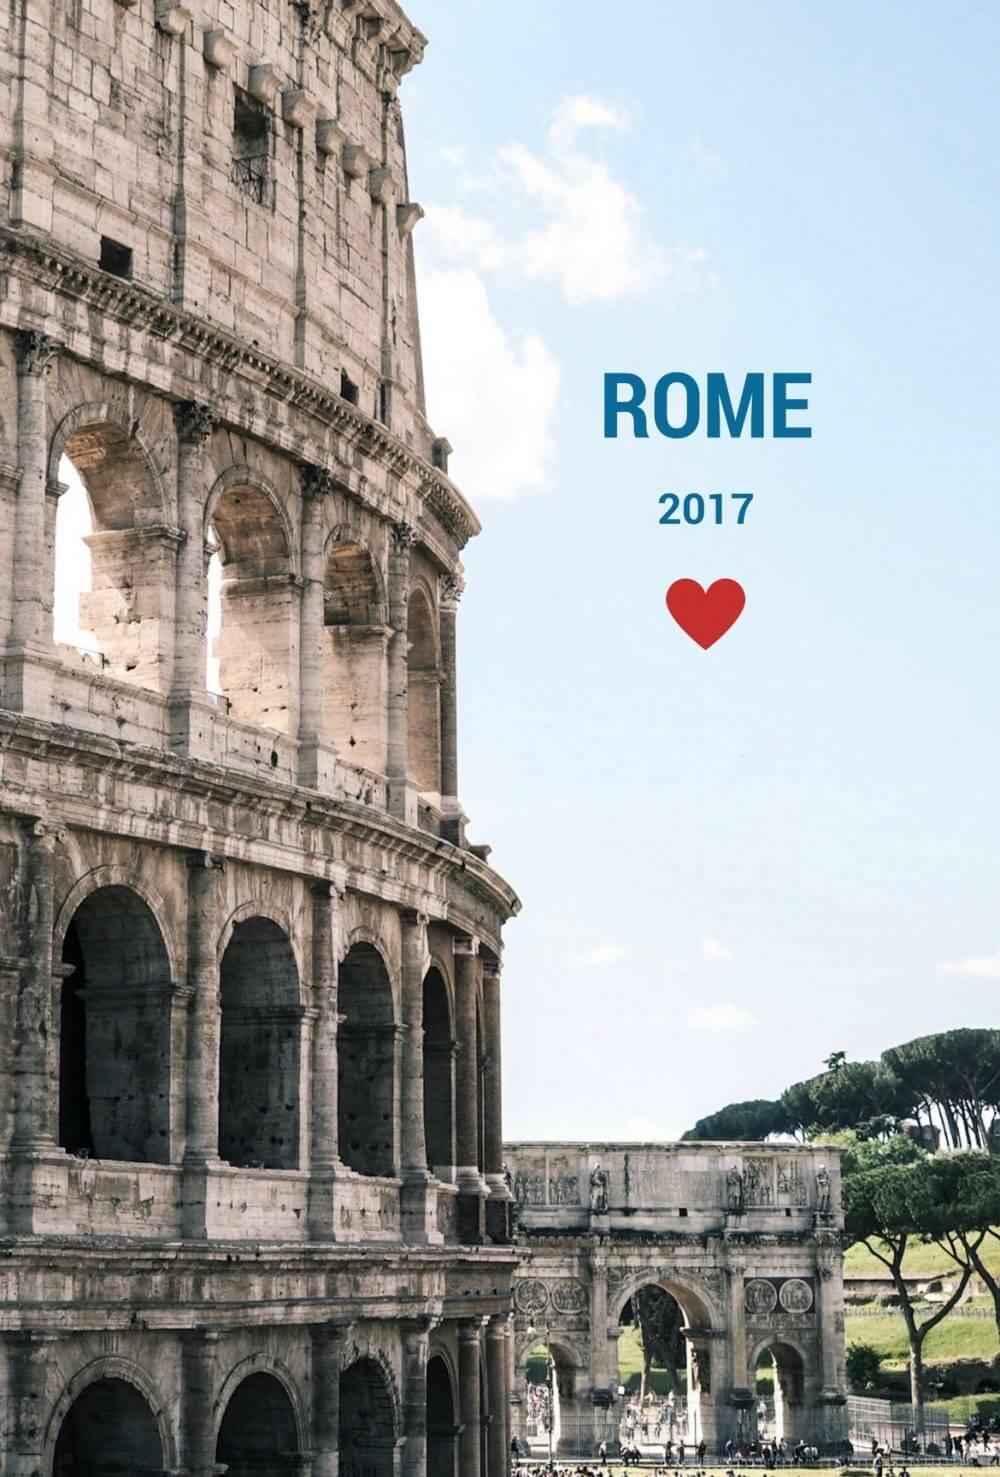 Heart Rome 2017